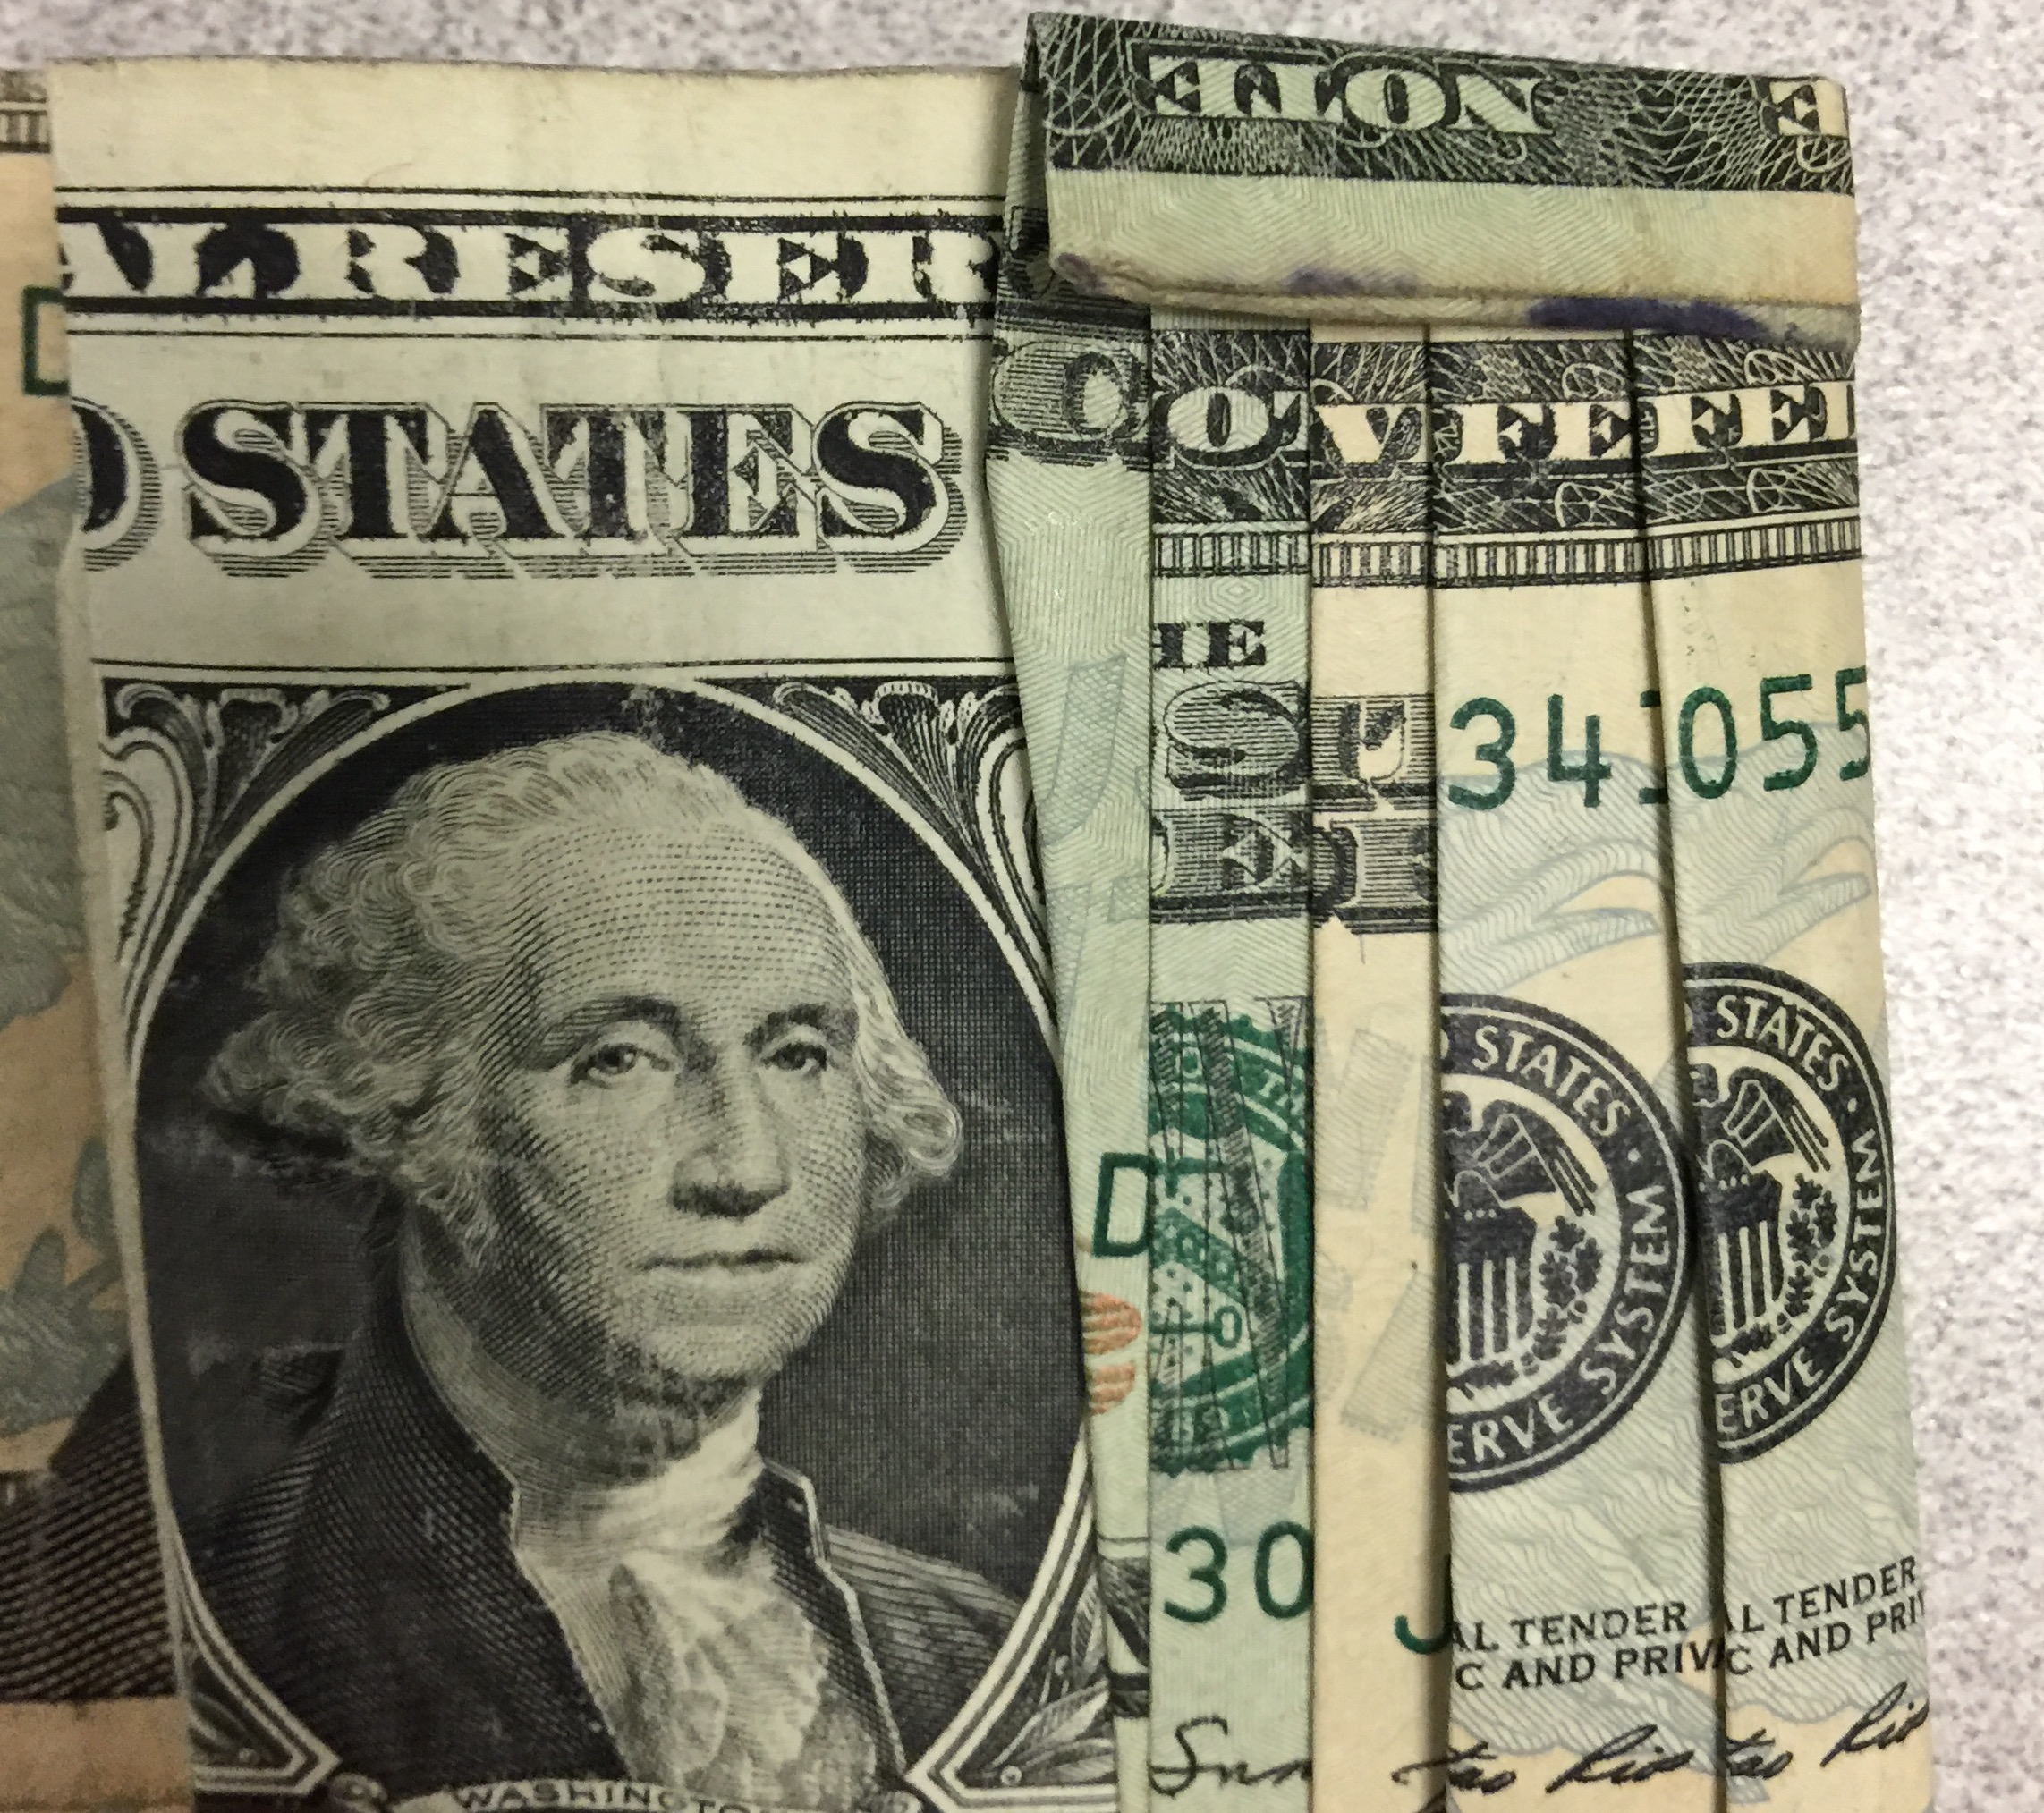 e38 george washington next to covfefe on 20 dollar bills know your meme